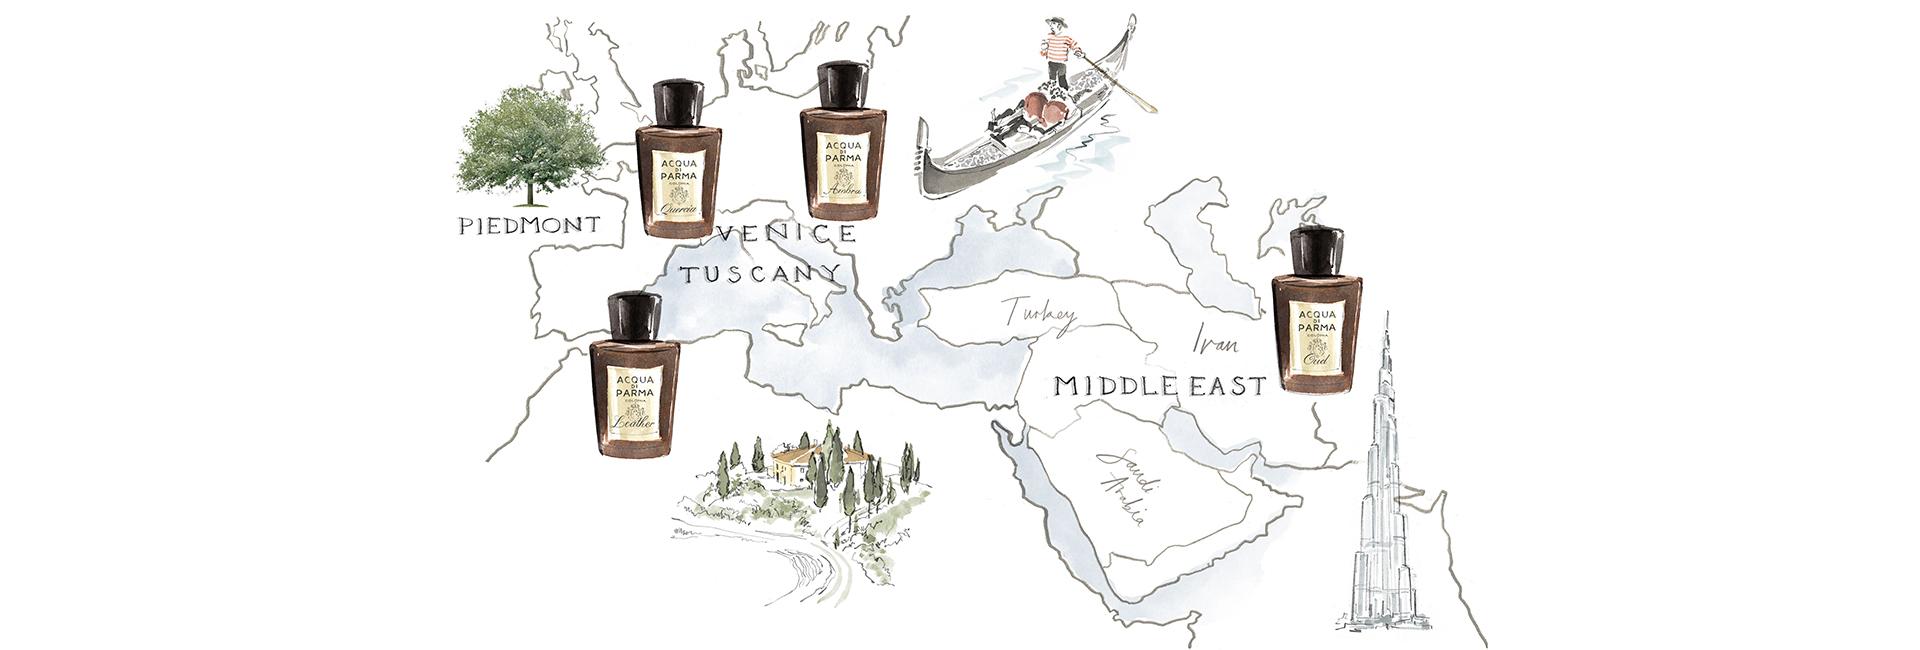 dessin-acqua-di-parma-colonia-blog-beaute-soin-parfum-homme